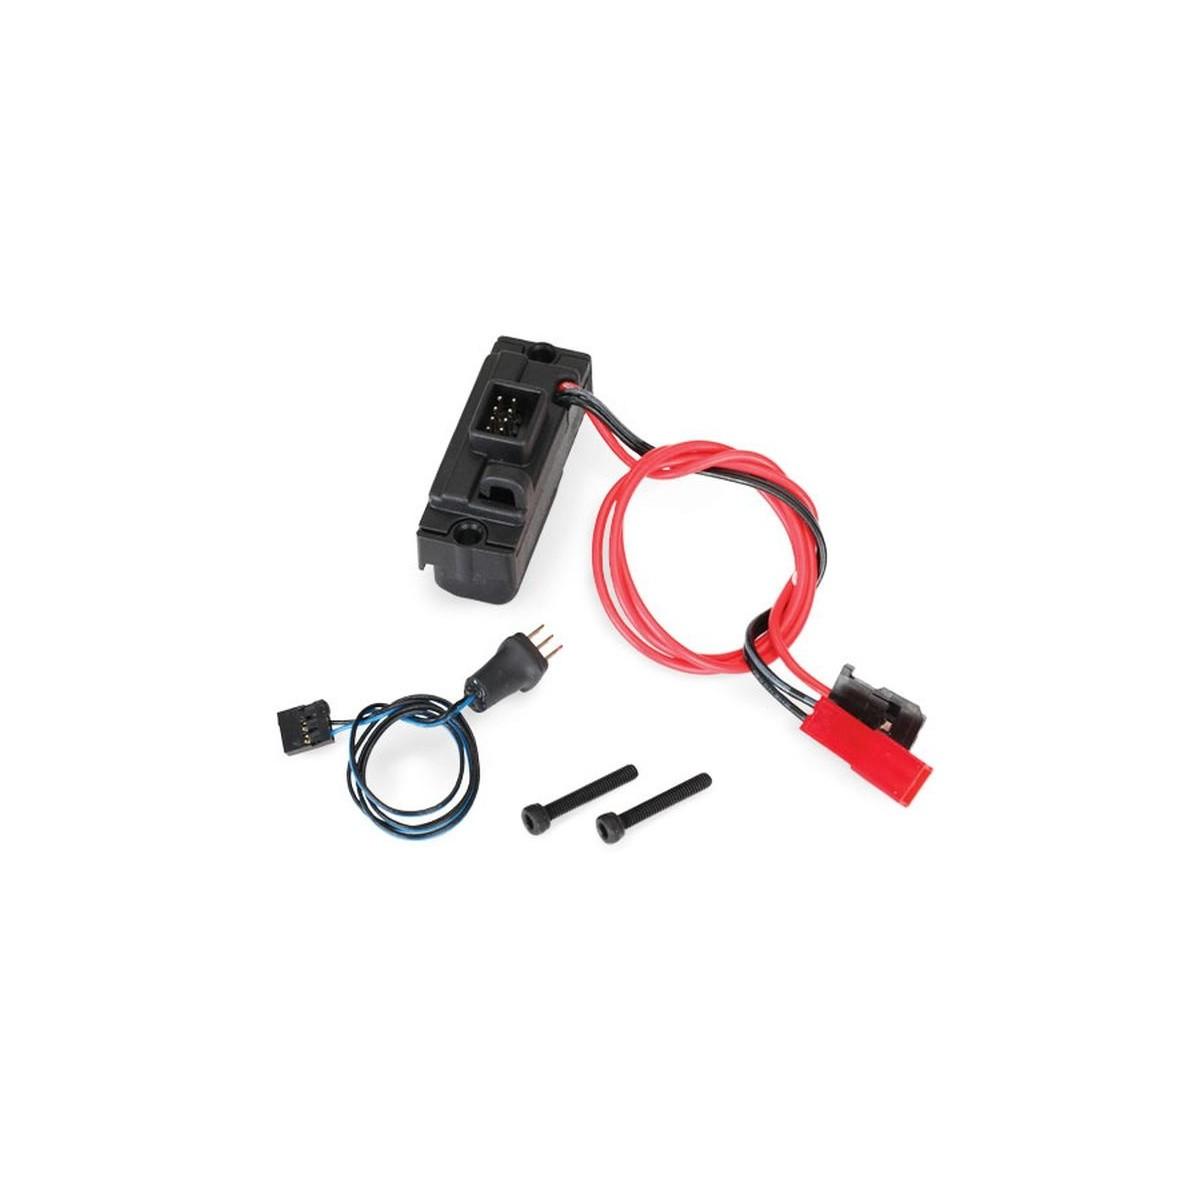 Traxxas Led Lights Power Supply Trx 4 3 In 1 Wire Harness Ledwiringharnessmain1jpg